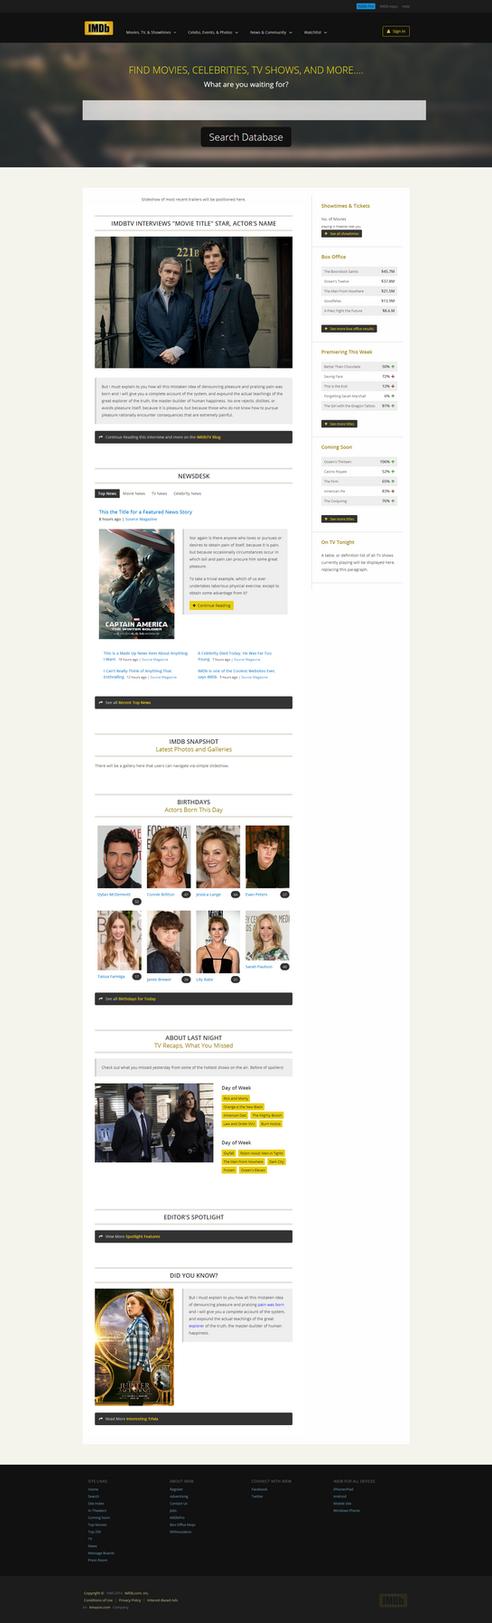 IMDB Redesign WIP by vanessabanessa89